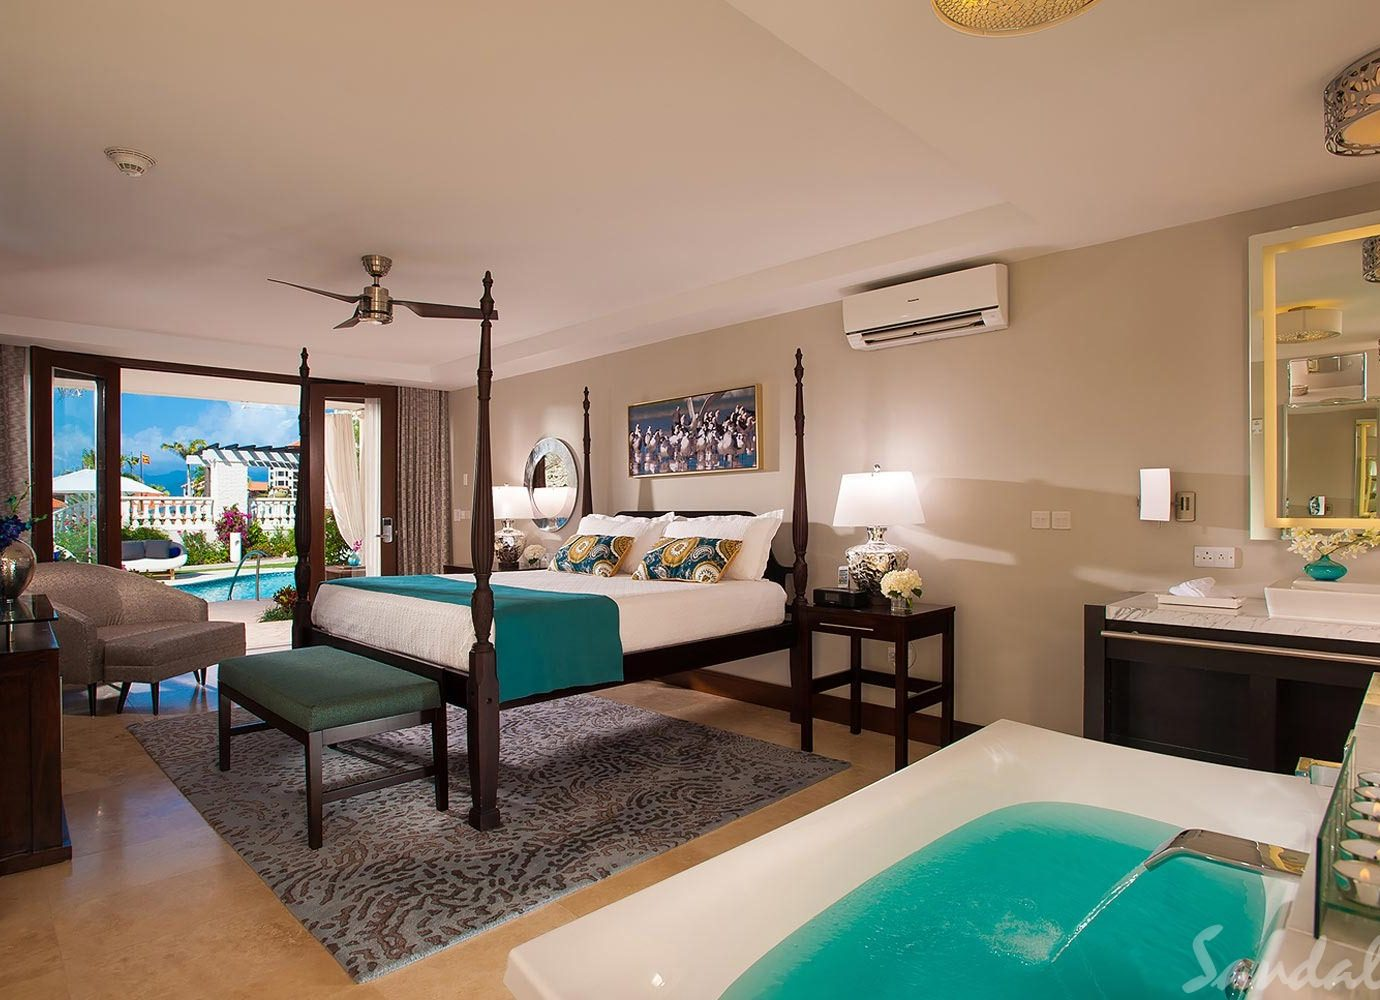 Bedroom at Sandals Grenada